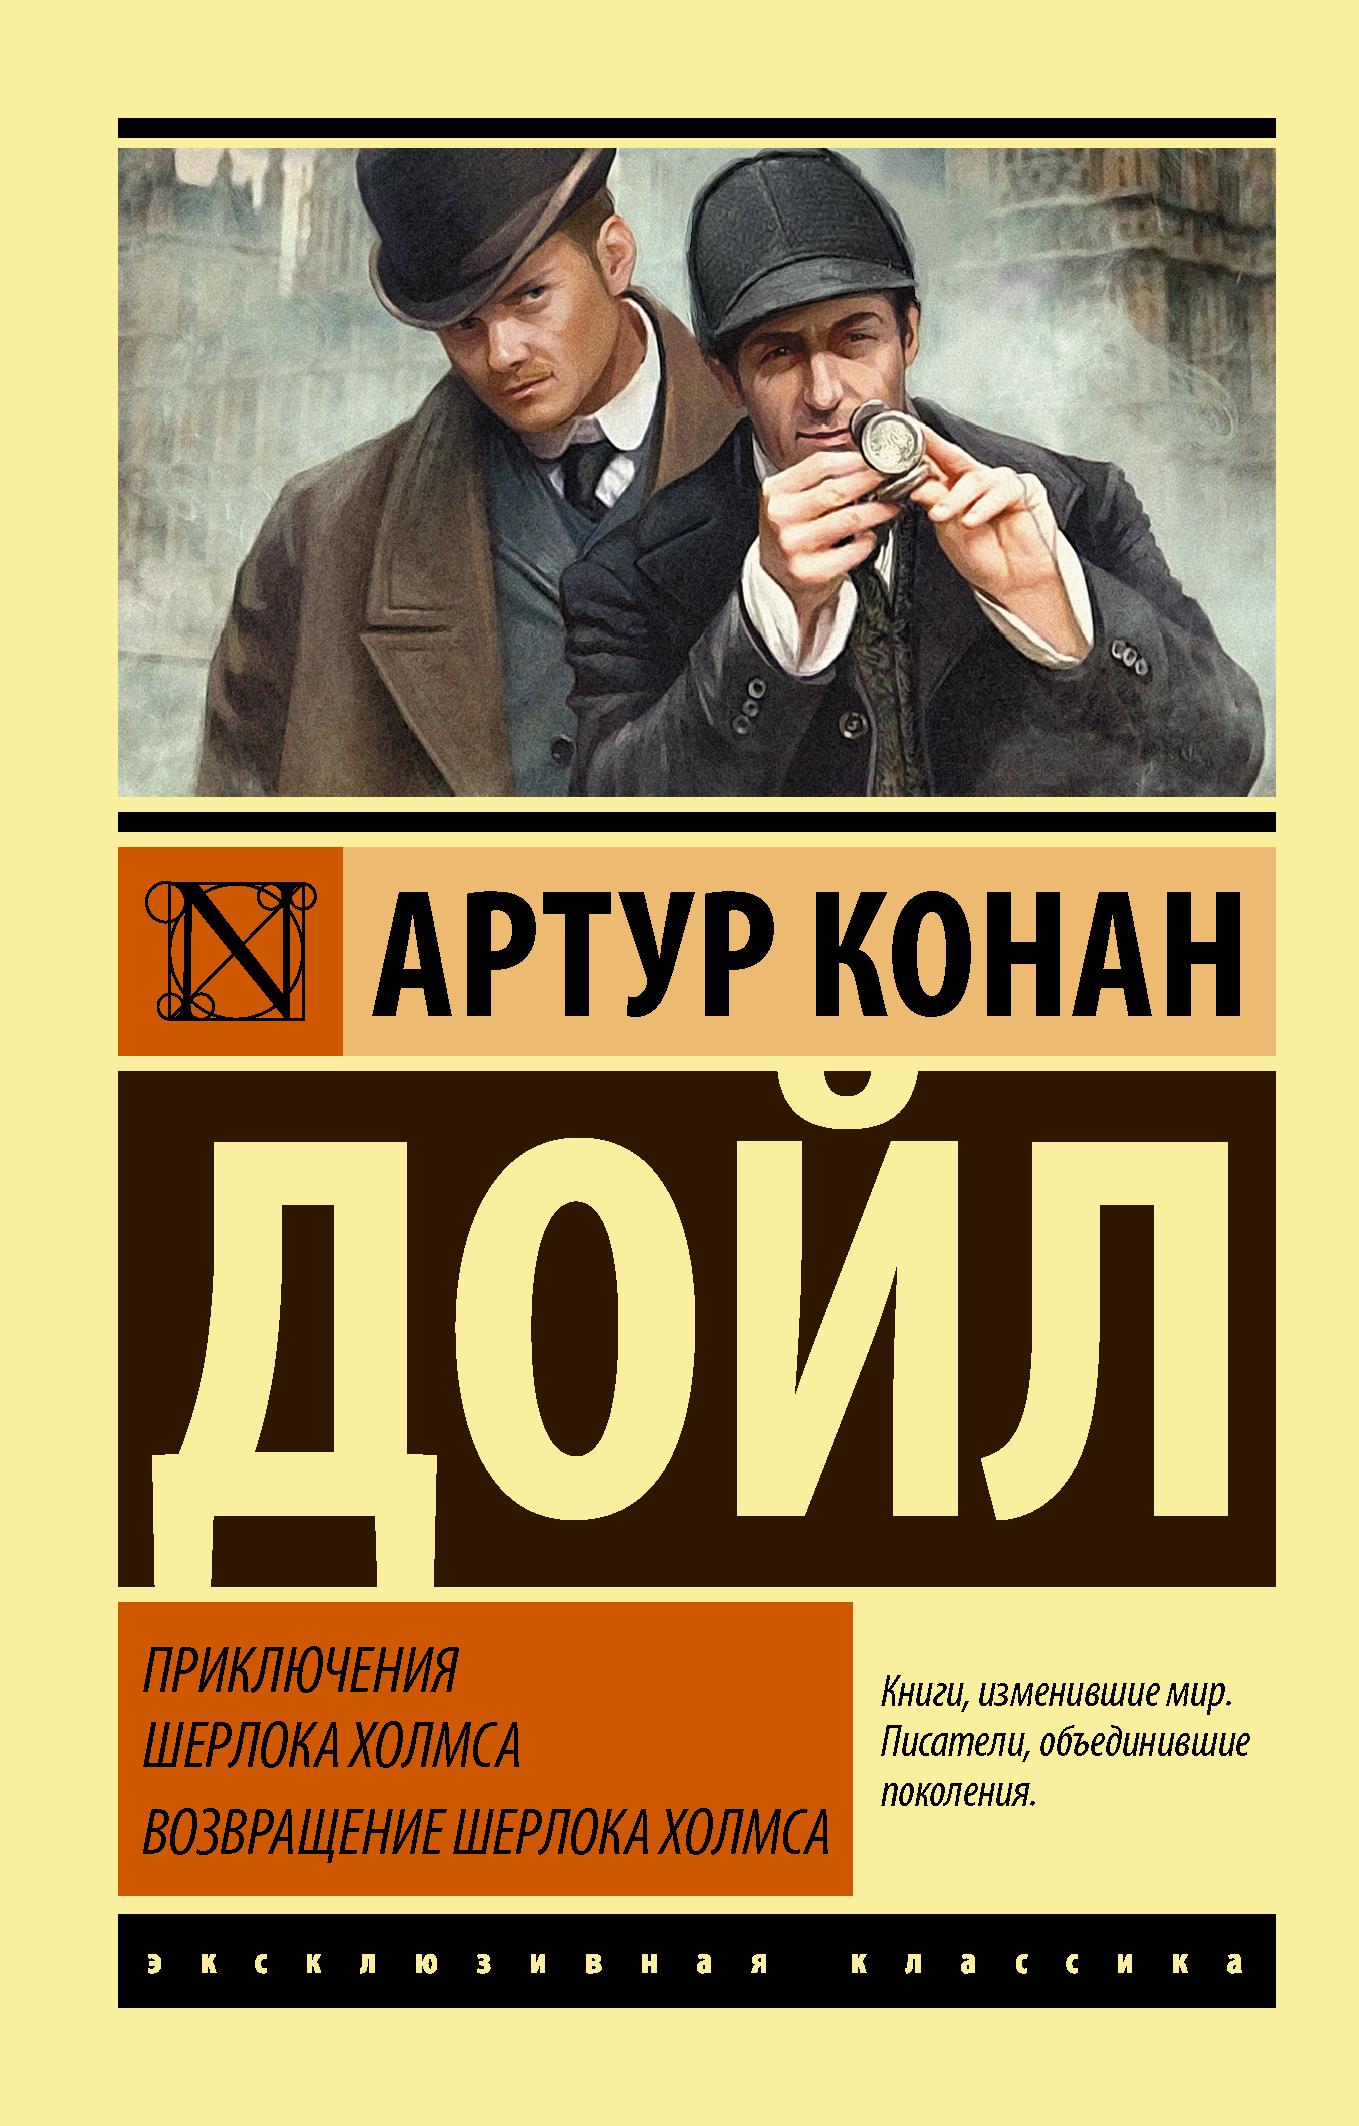 Артур Конан Дойл - Приключения Шерлока Холмса. Возвращение Шерлока Холмса